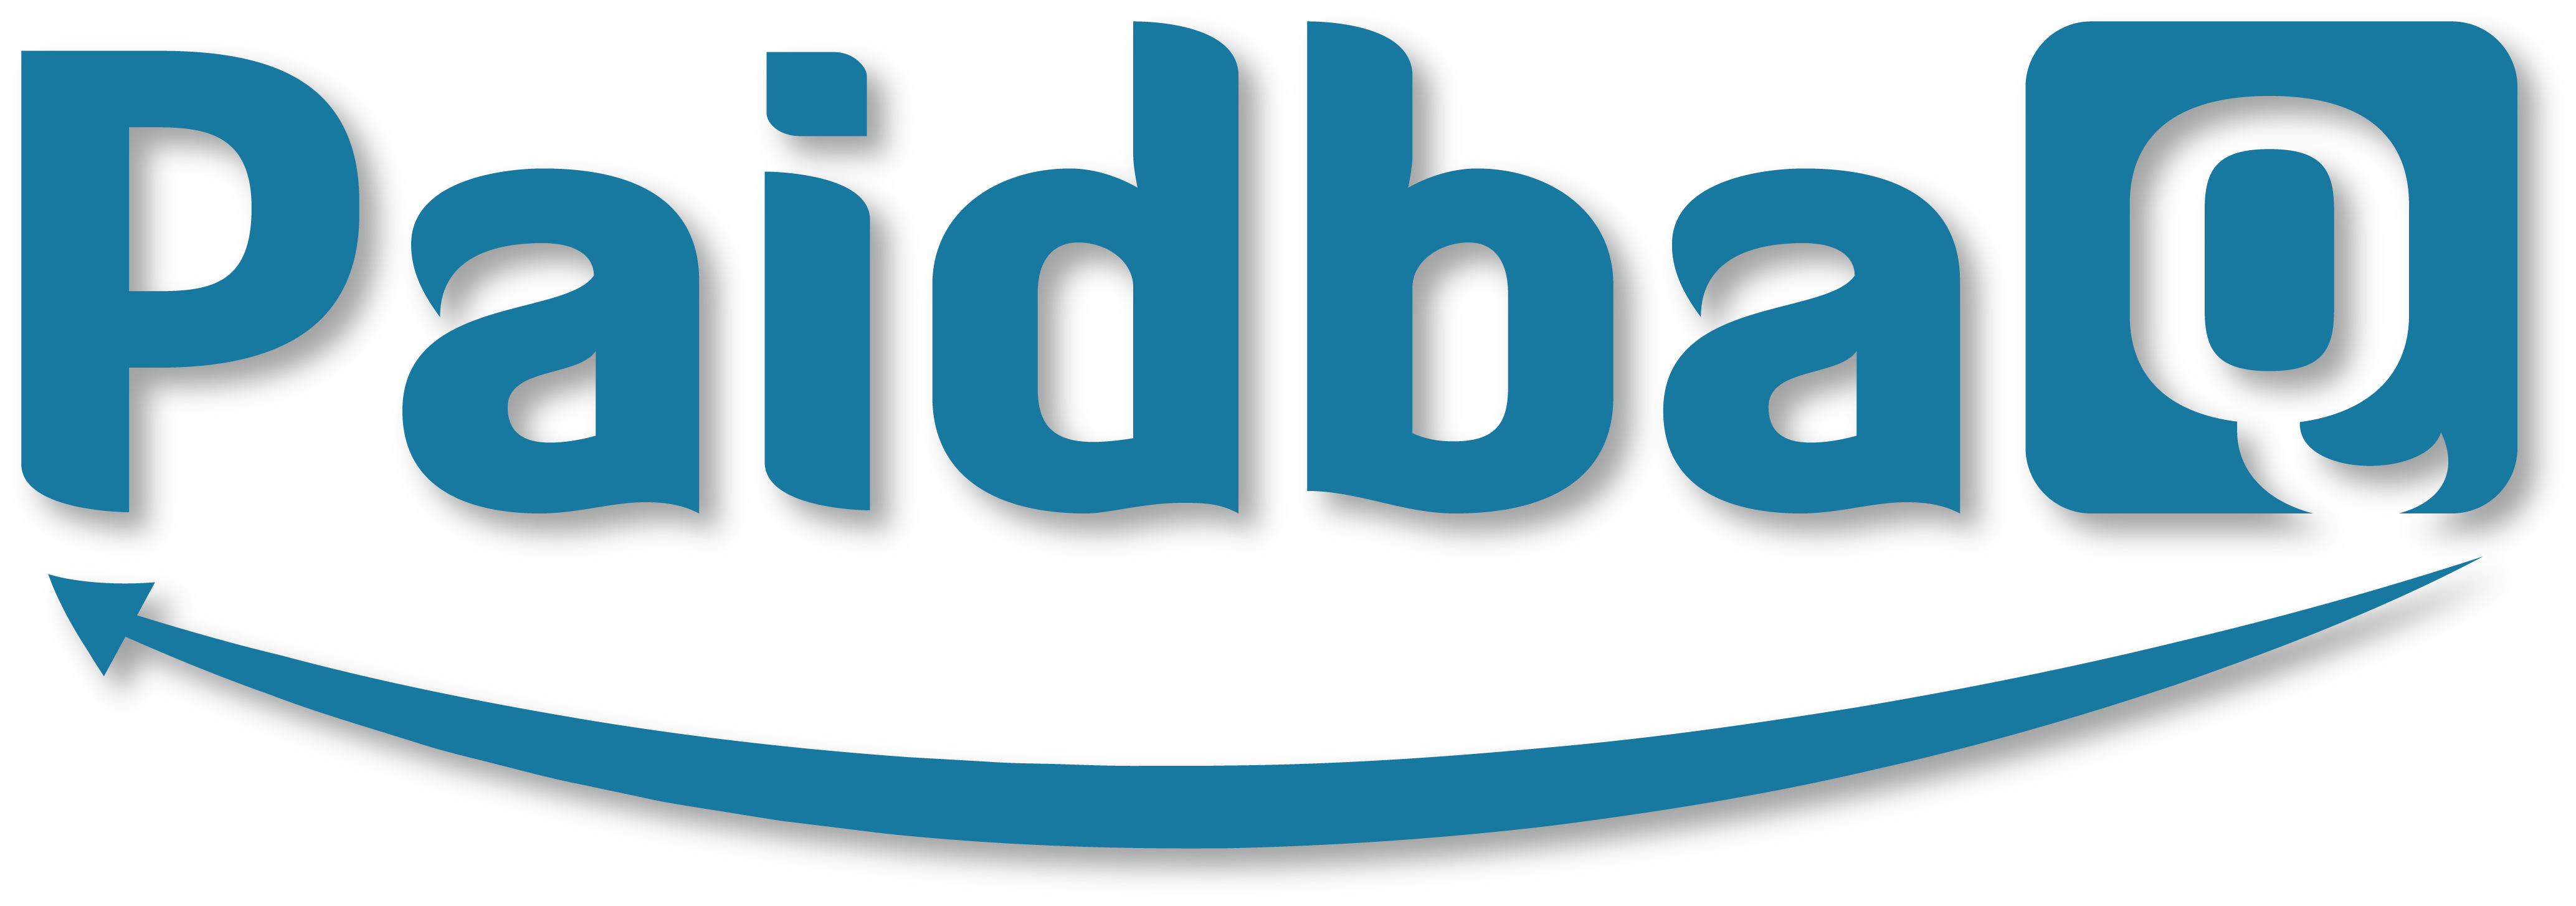 PaidbaQ company logo